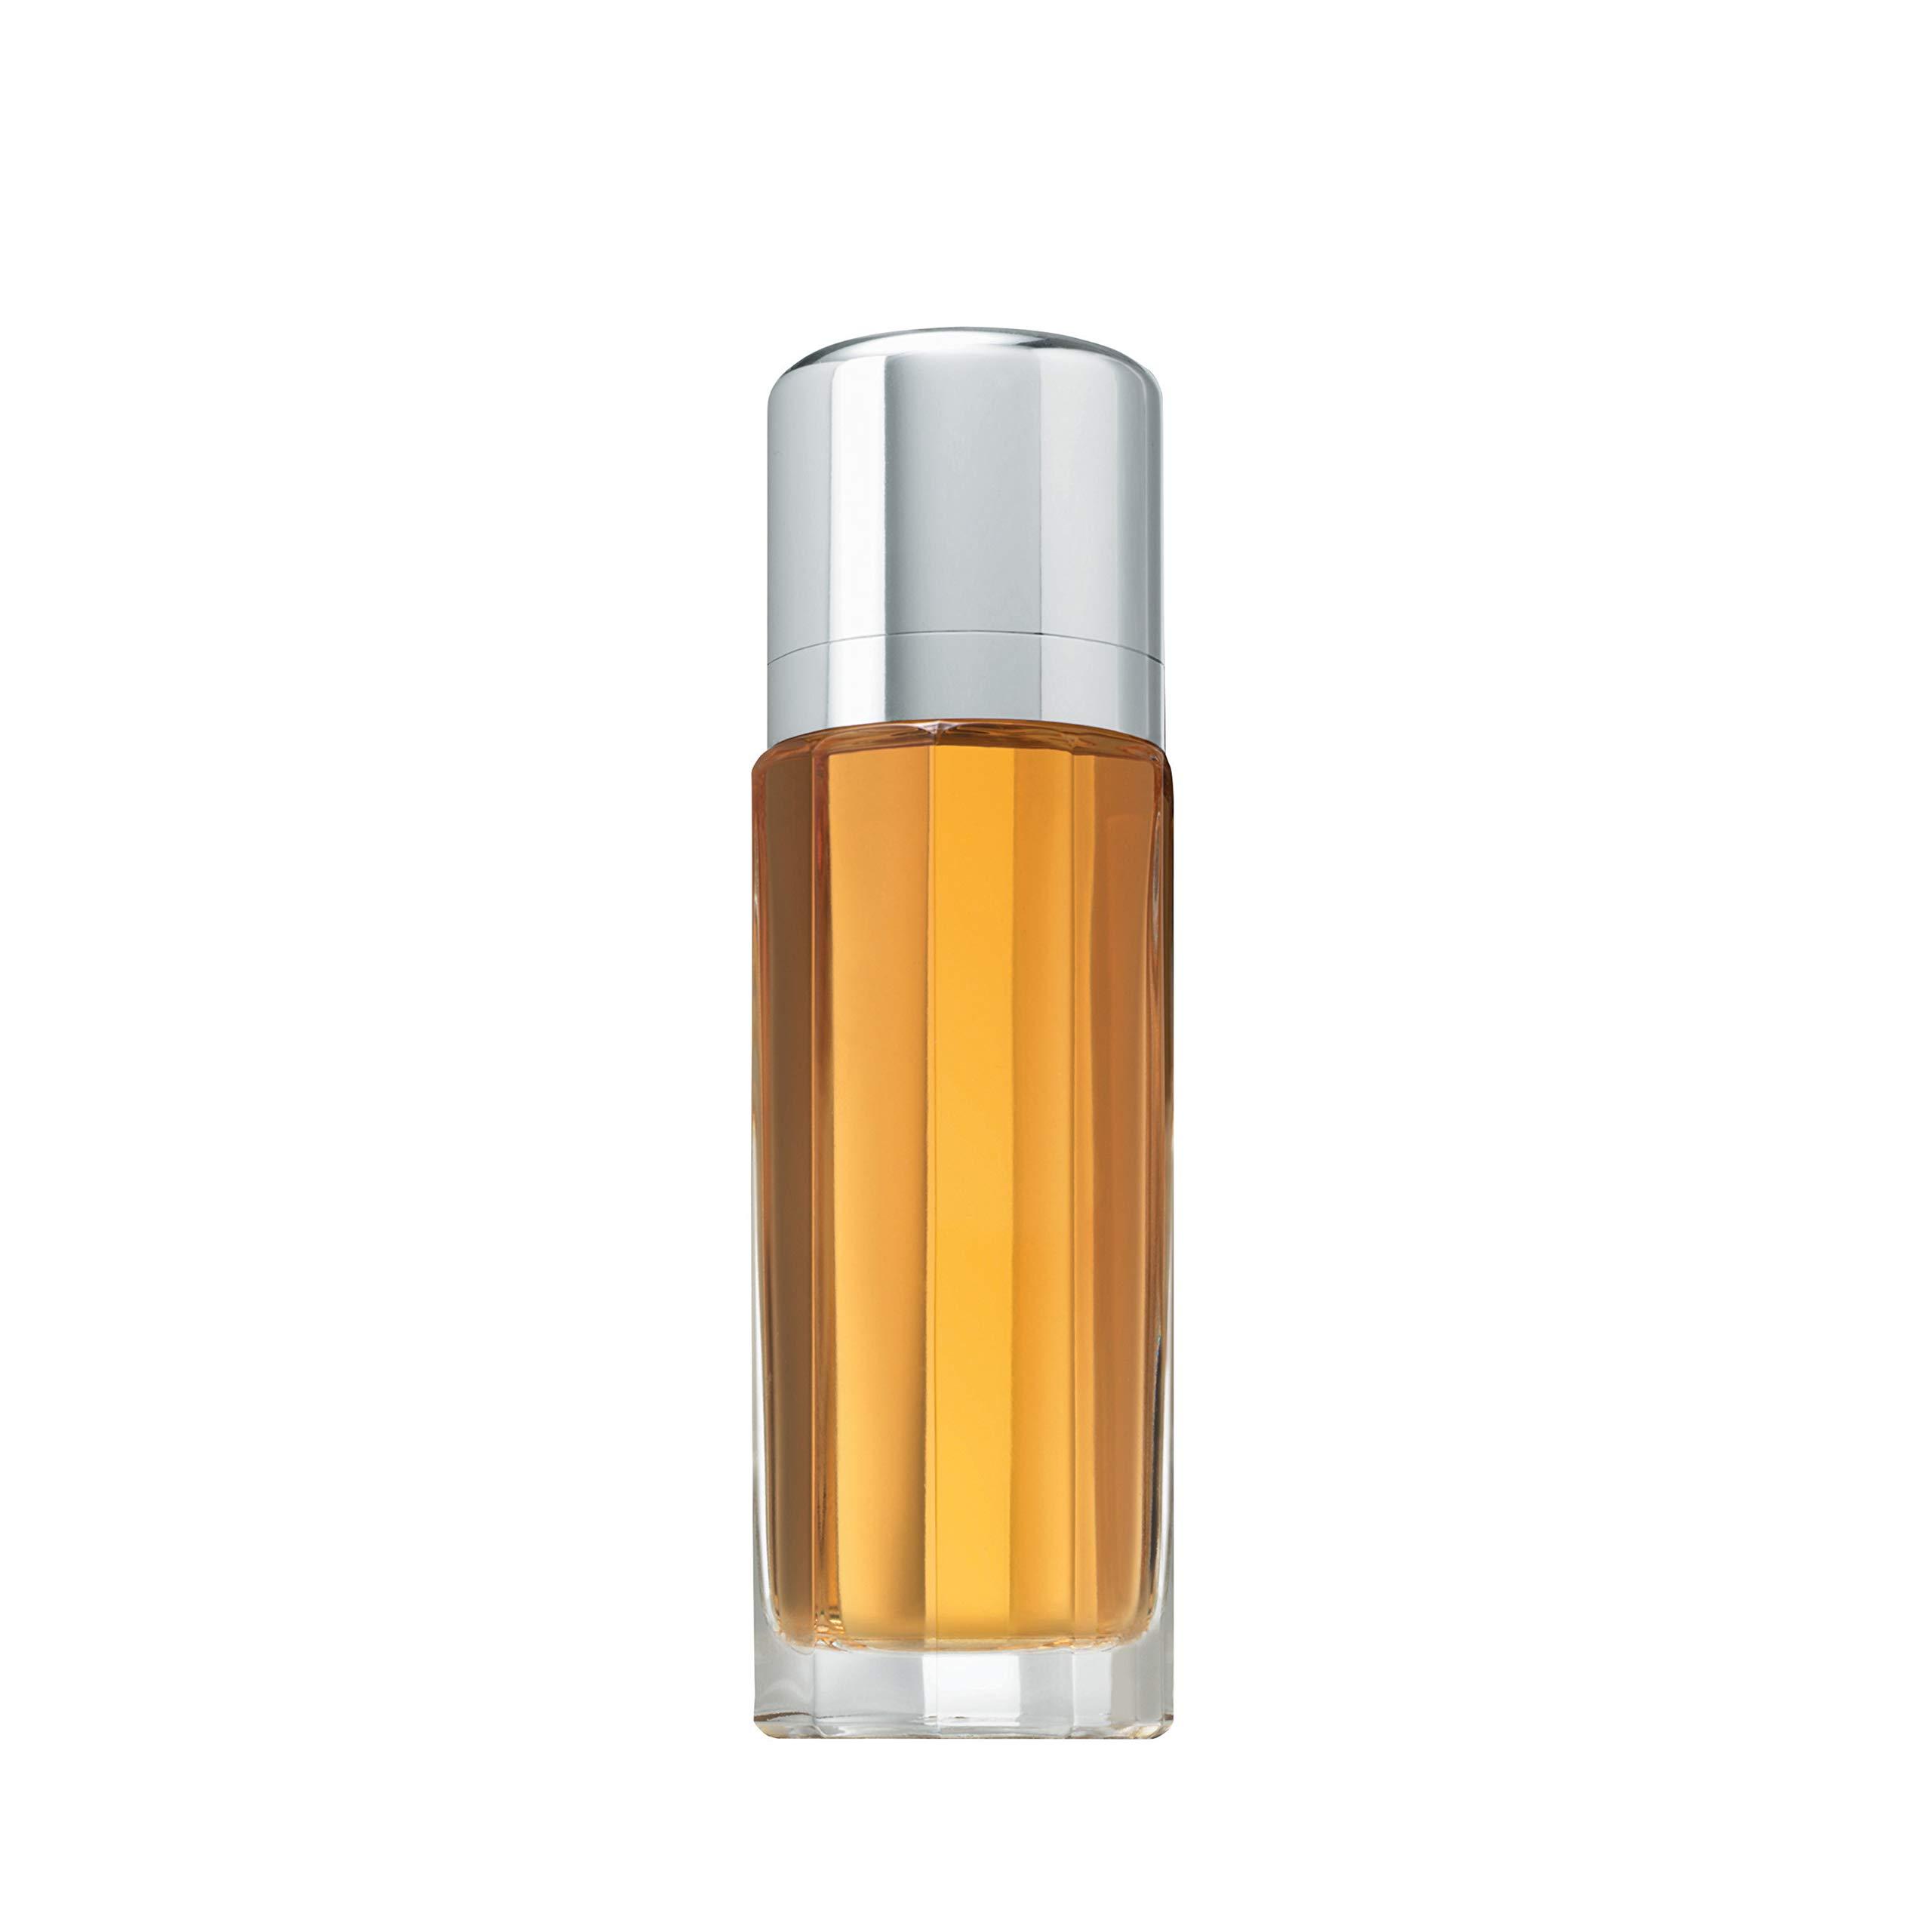 Calvin Klein Women's Escape Eau de Parfum Spray, 3.4 fl. oz.